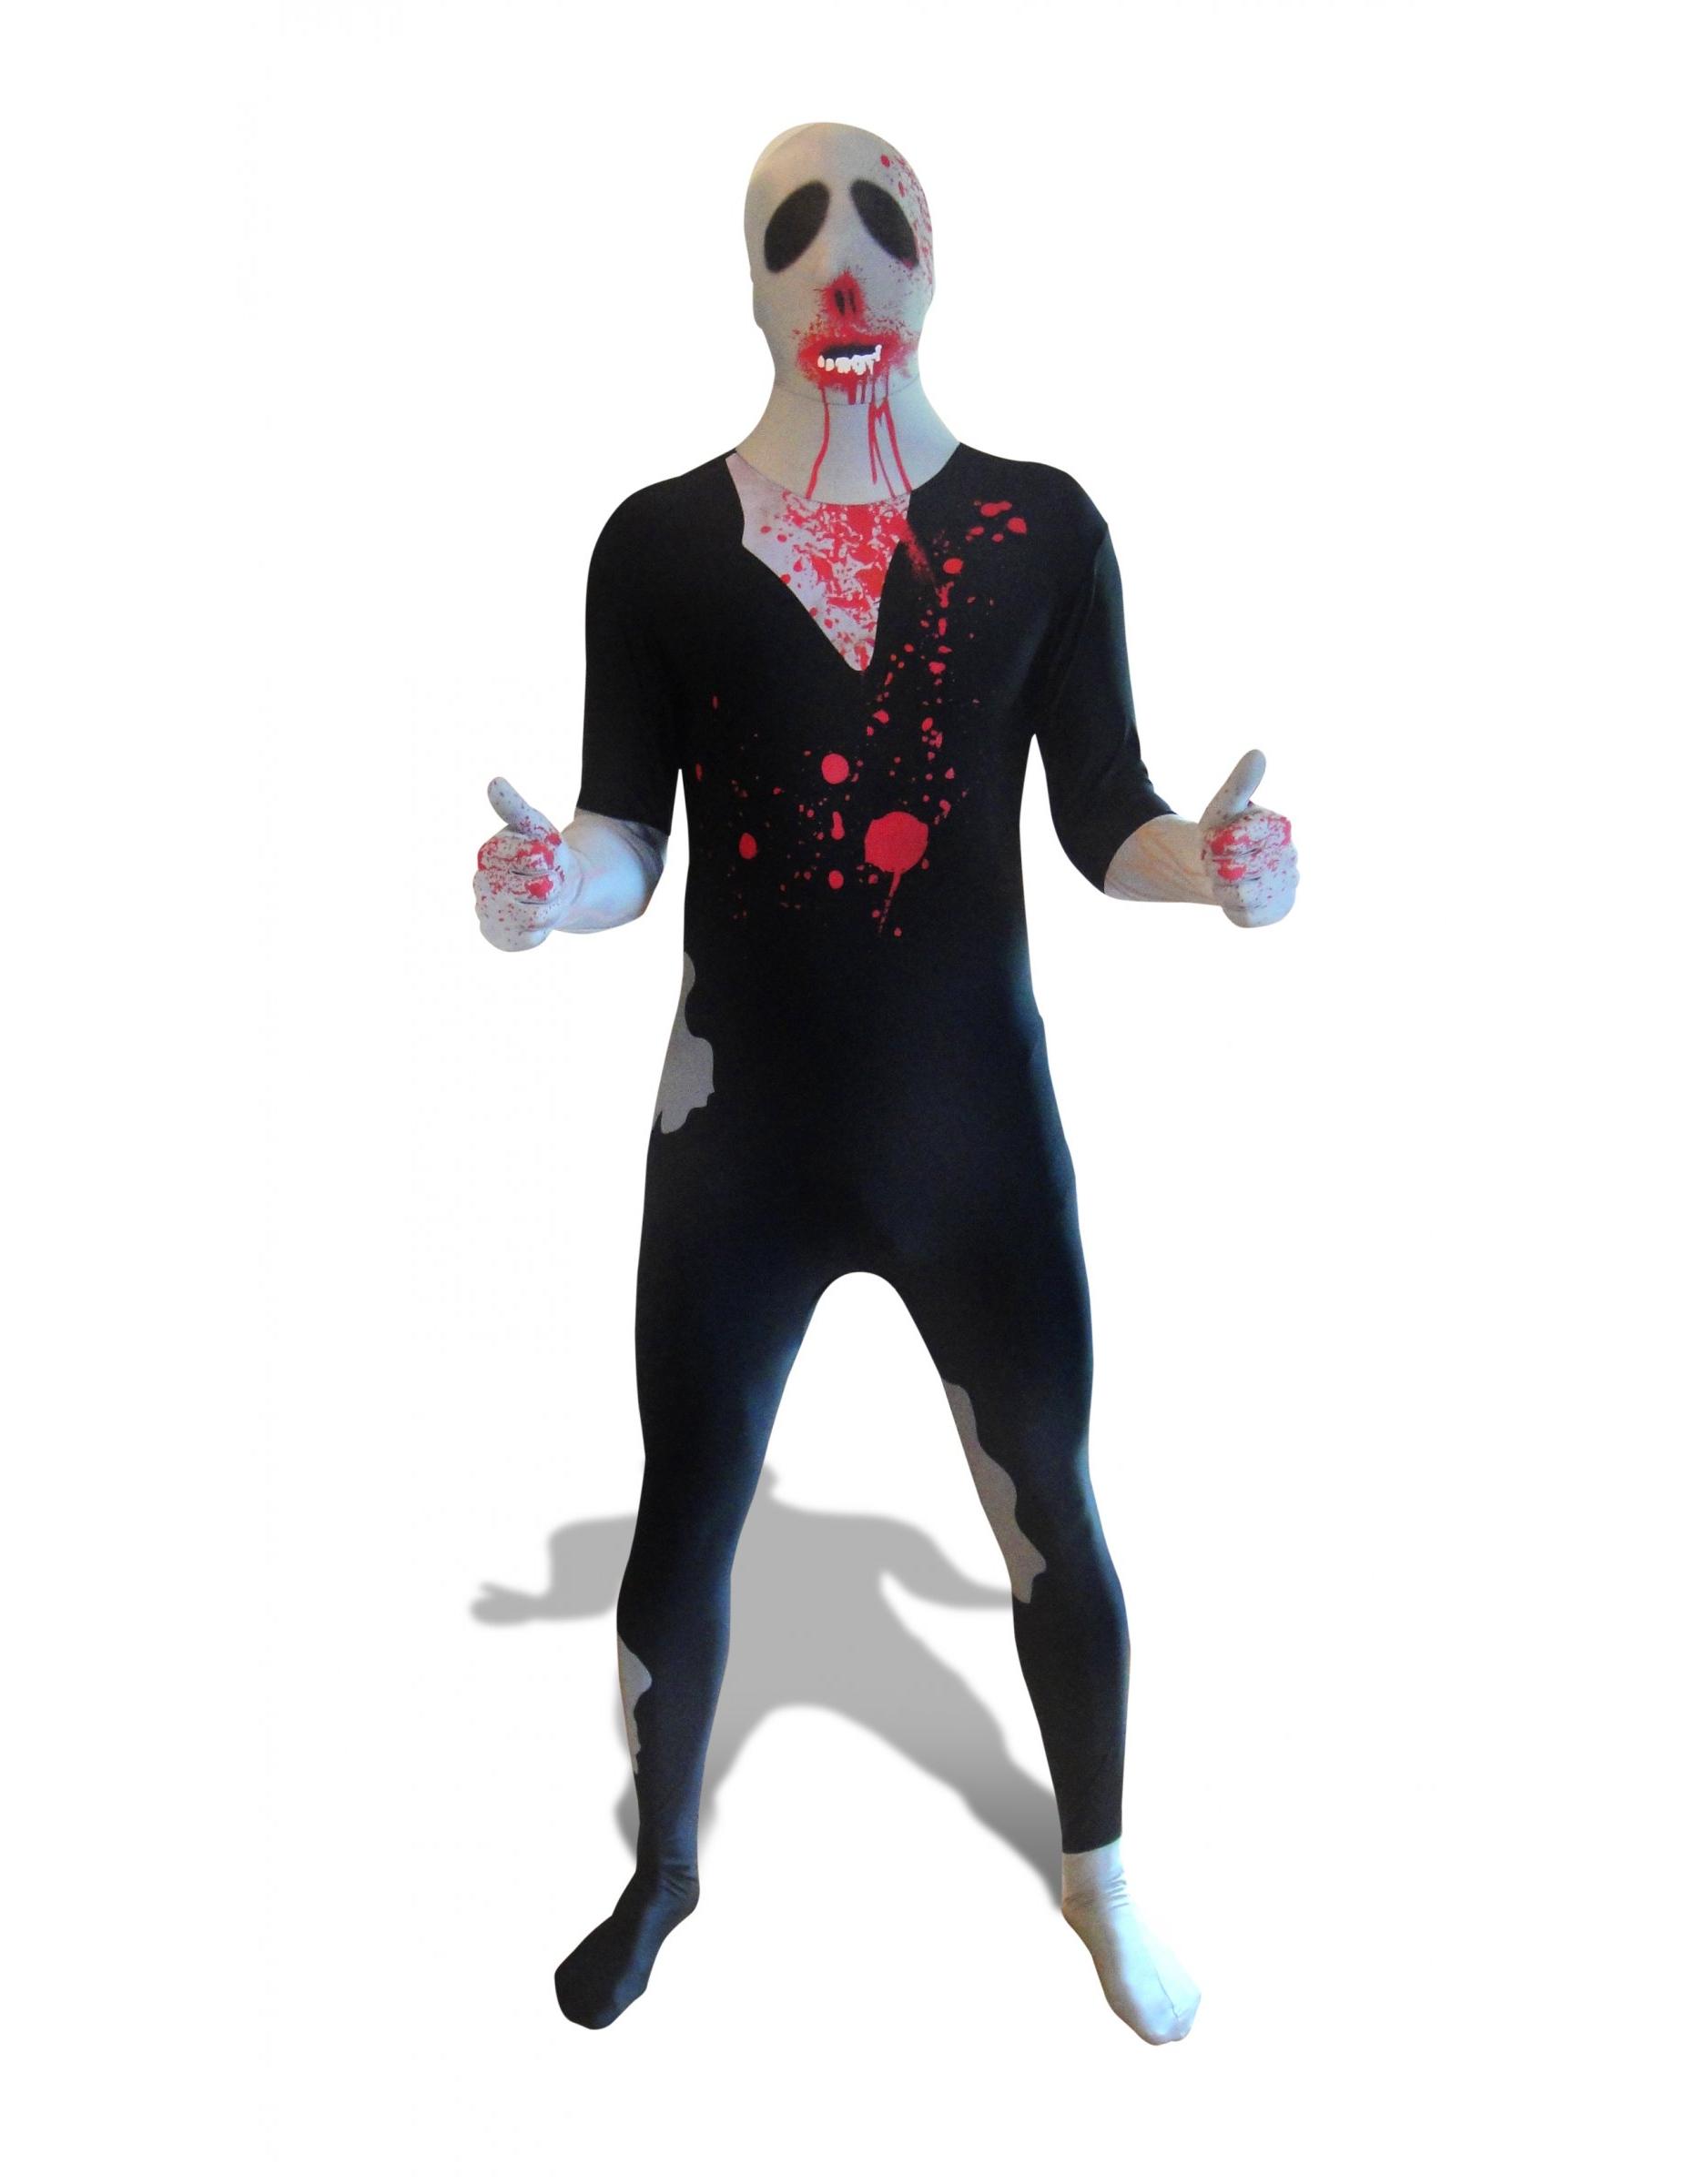 Morphsuit Costume Ideas